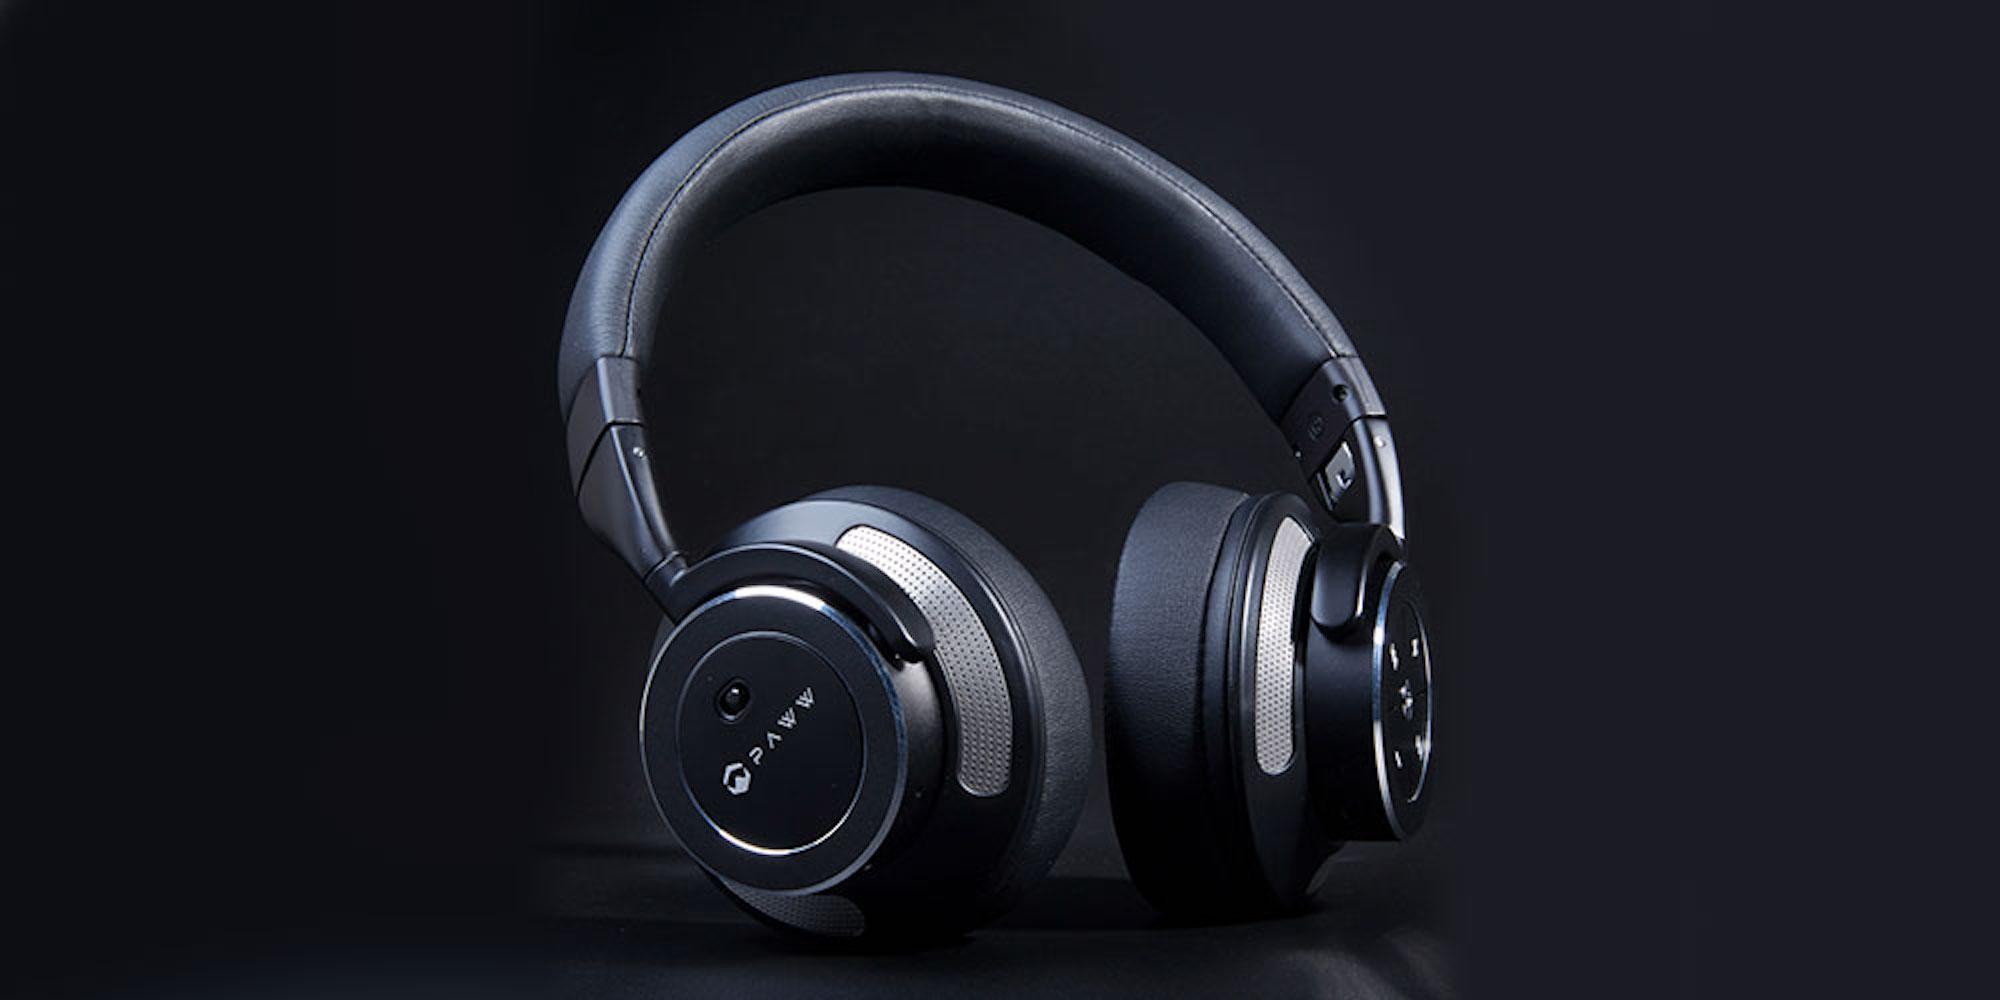 Enjoy Stunning Sound: WaveSound 3 Noise-Cancelling Bluetooth Headphones $80